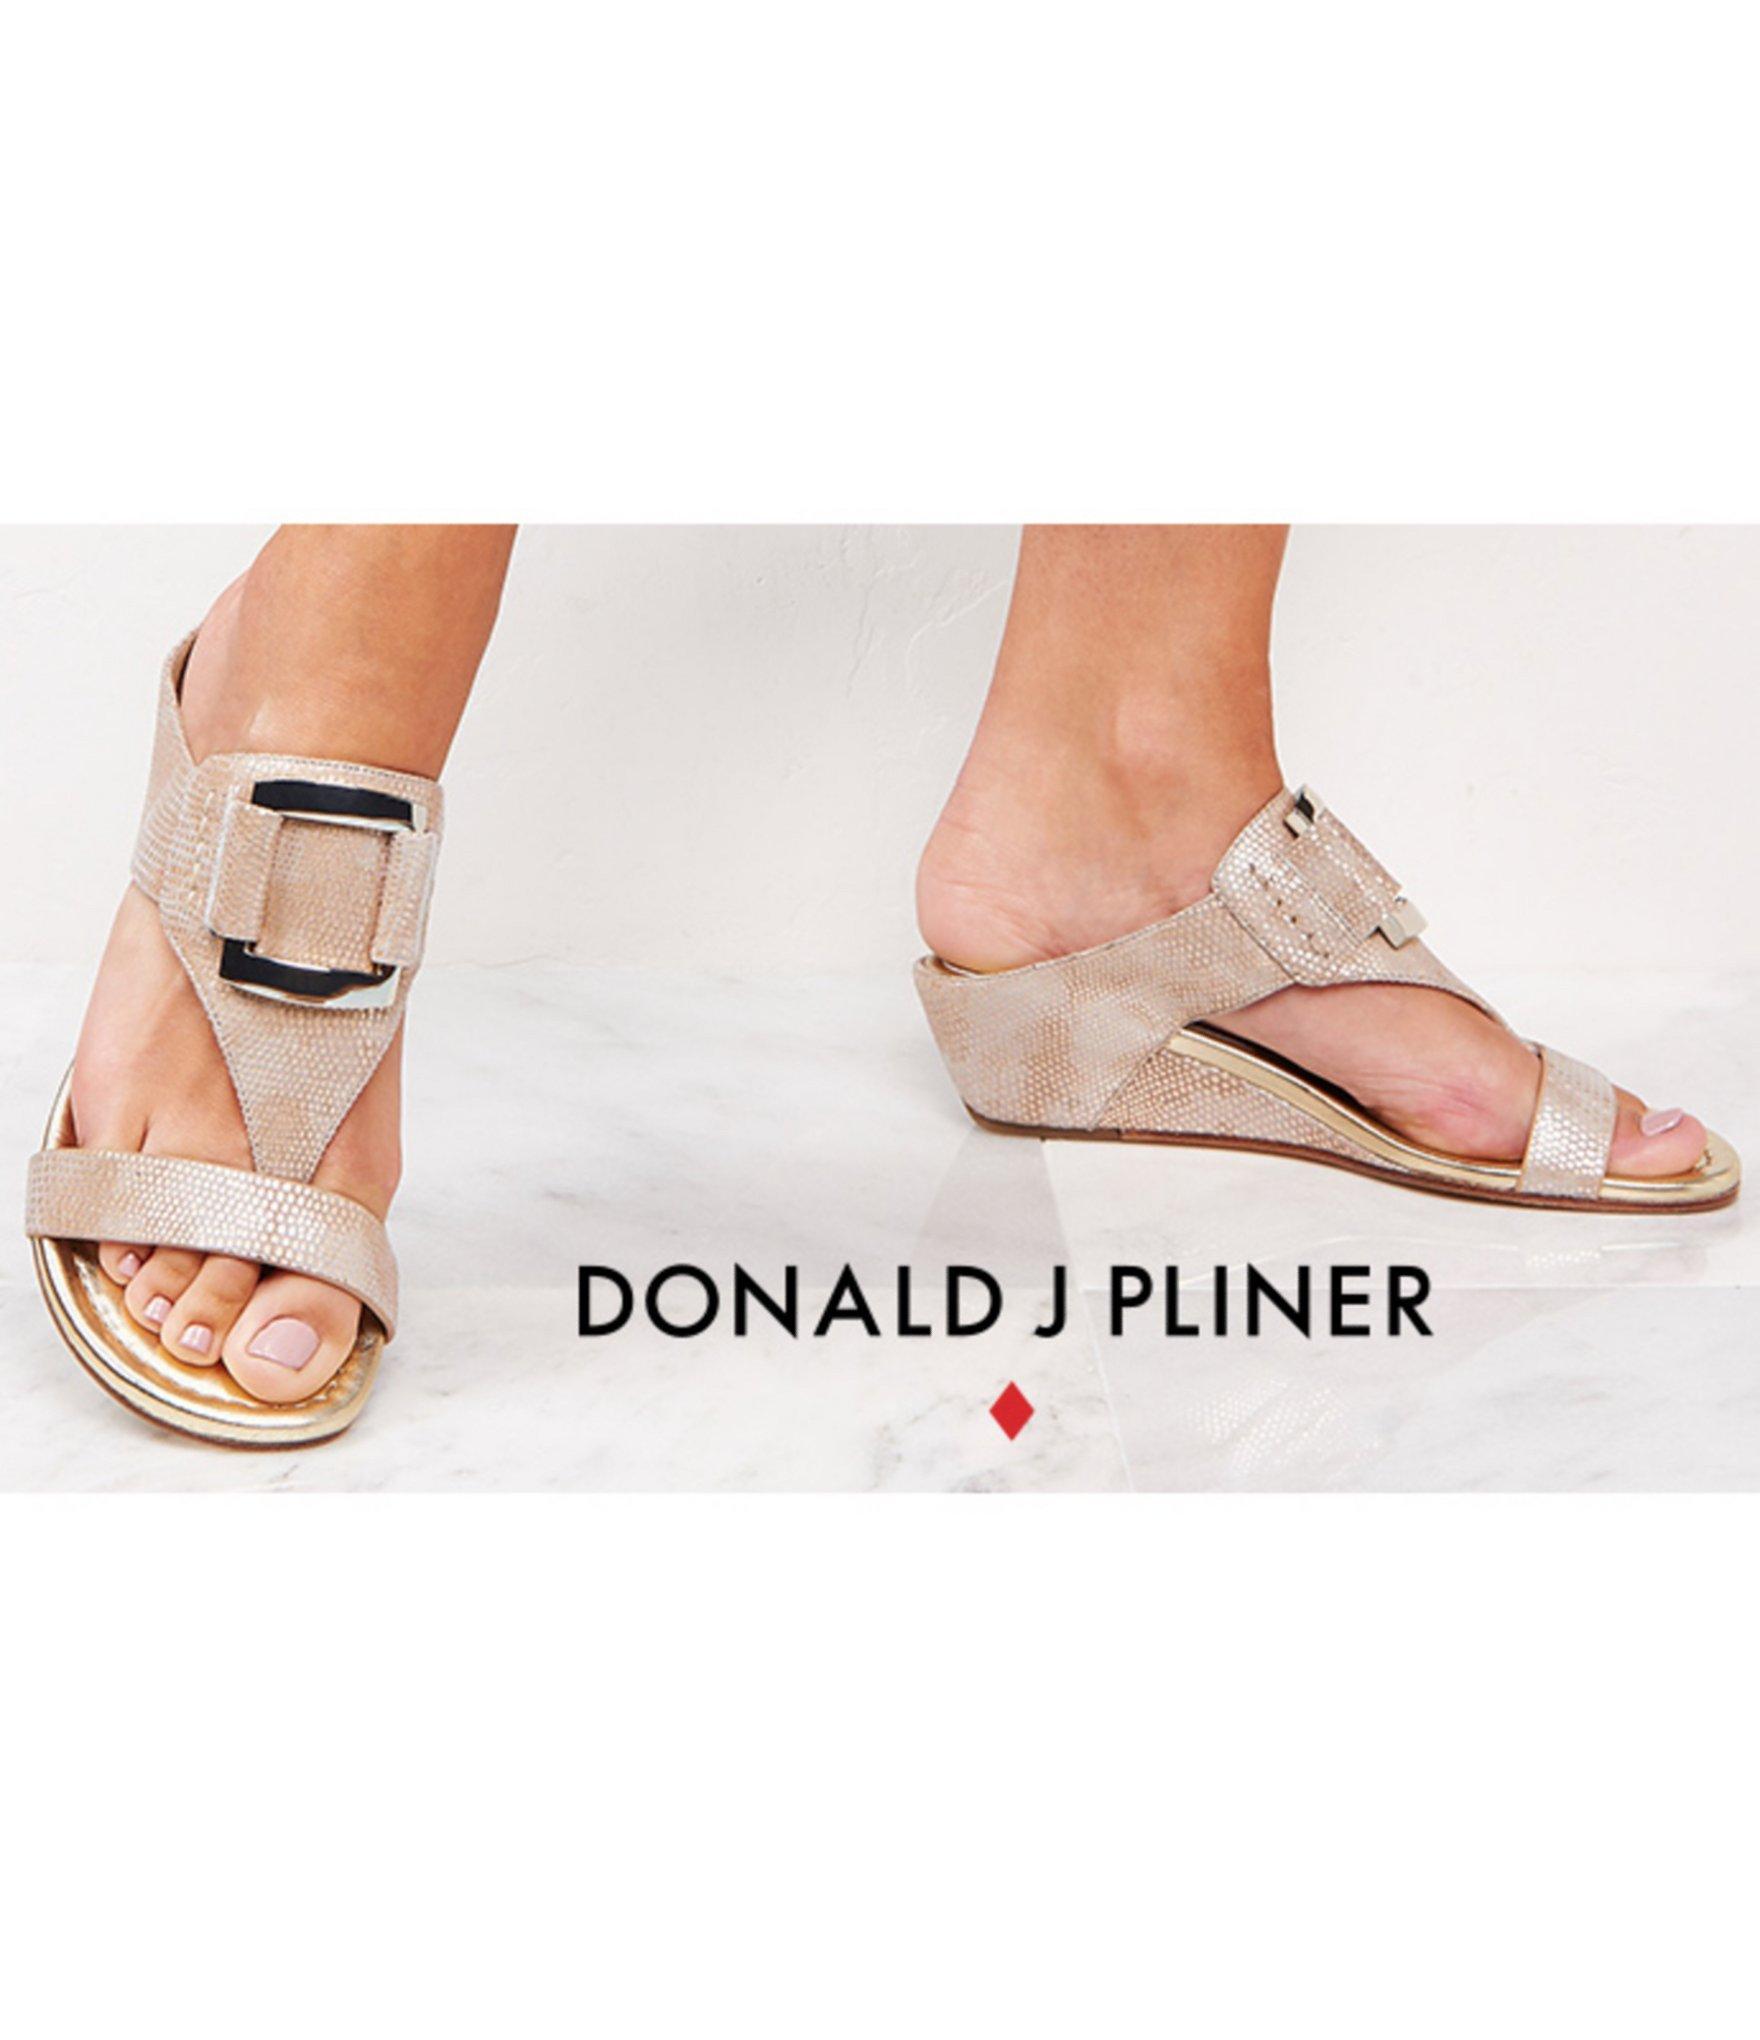 Donald J Pliner Daun Metallic Leather Lizard Print Wedge